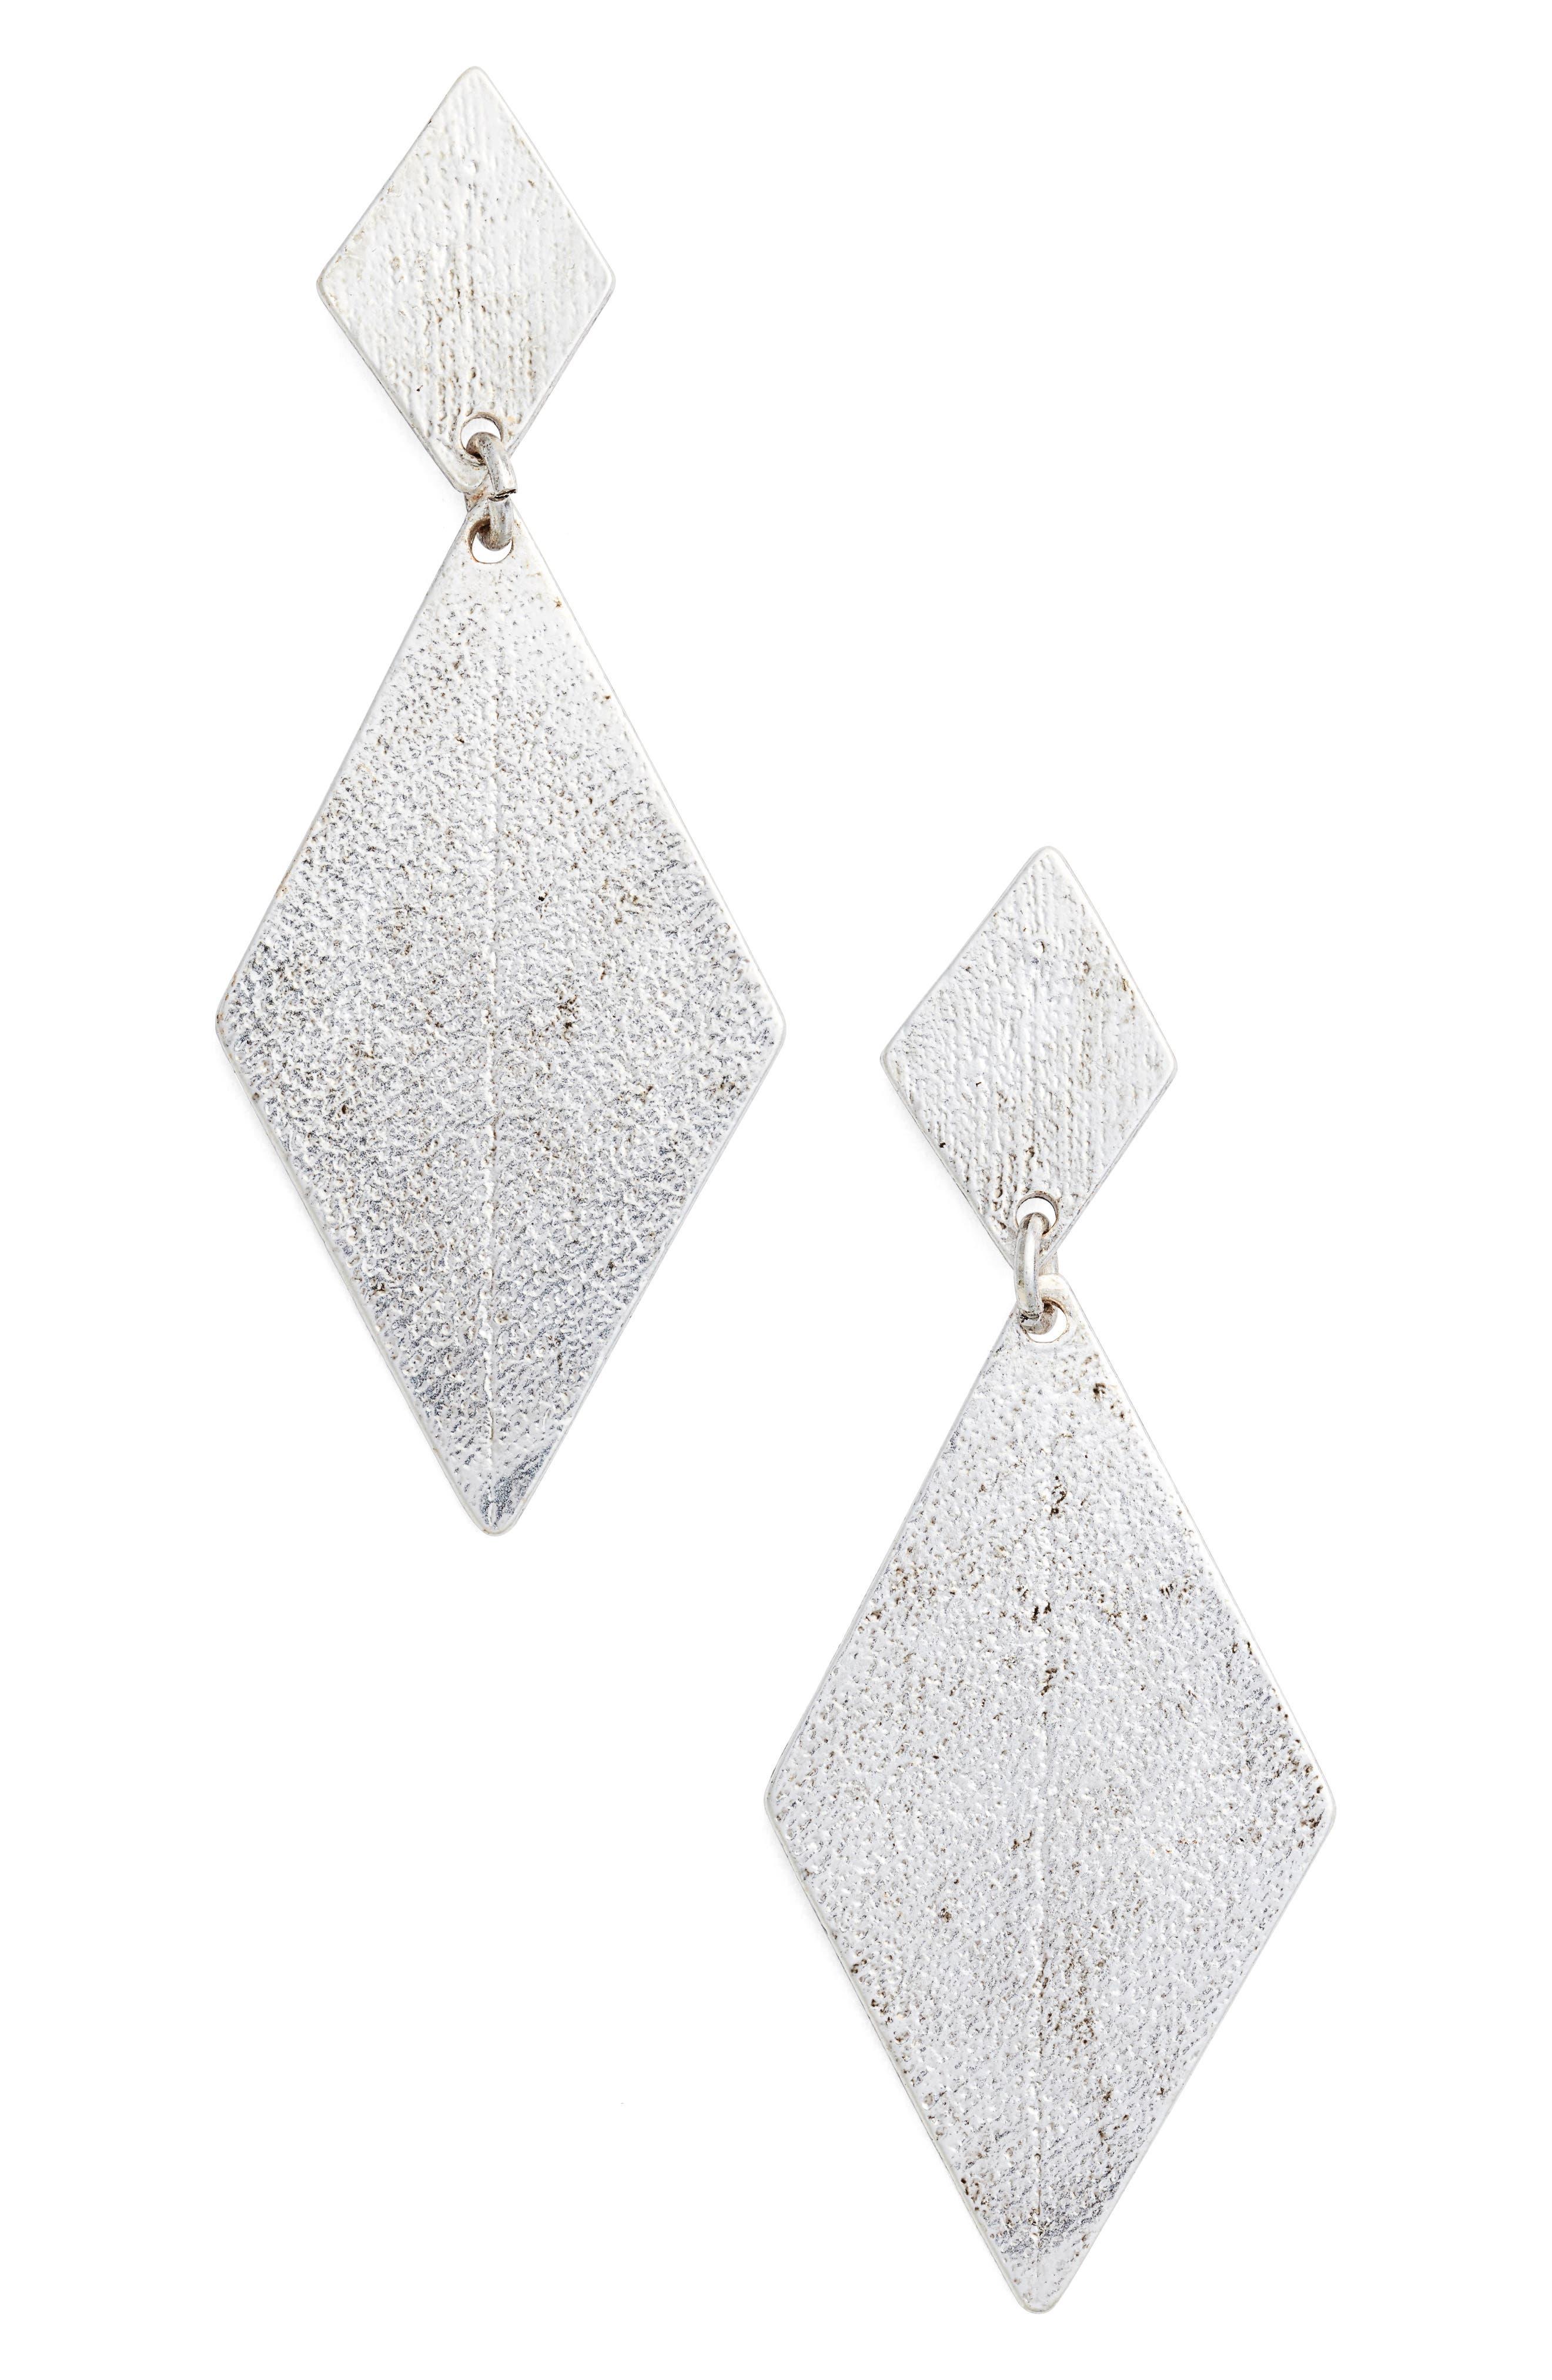 Kite Earrings,                             Main thumbnail 1, color,                             SILVER